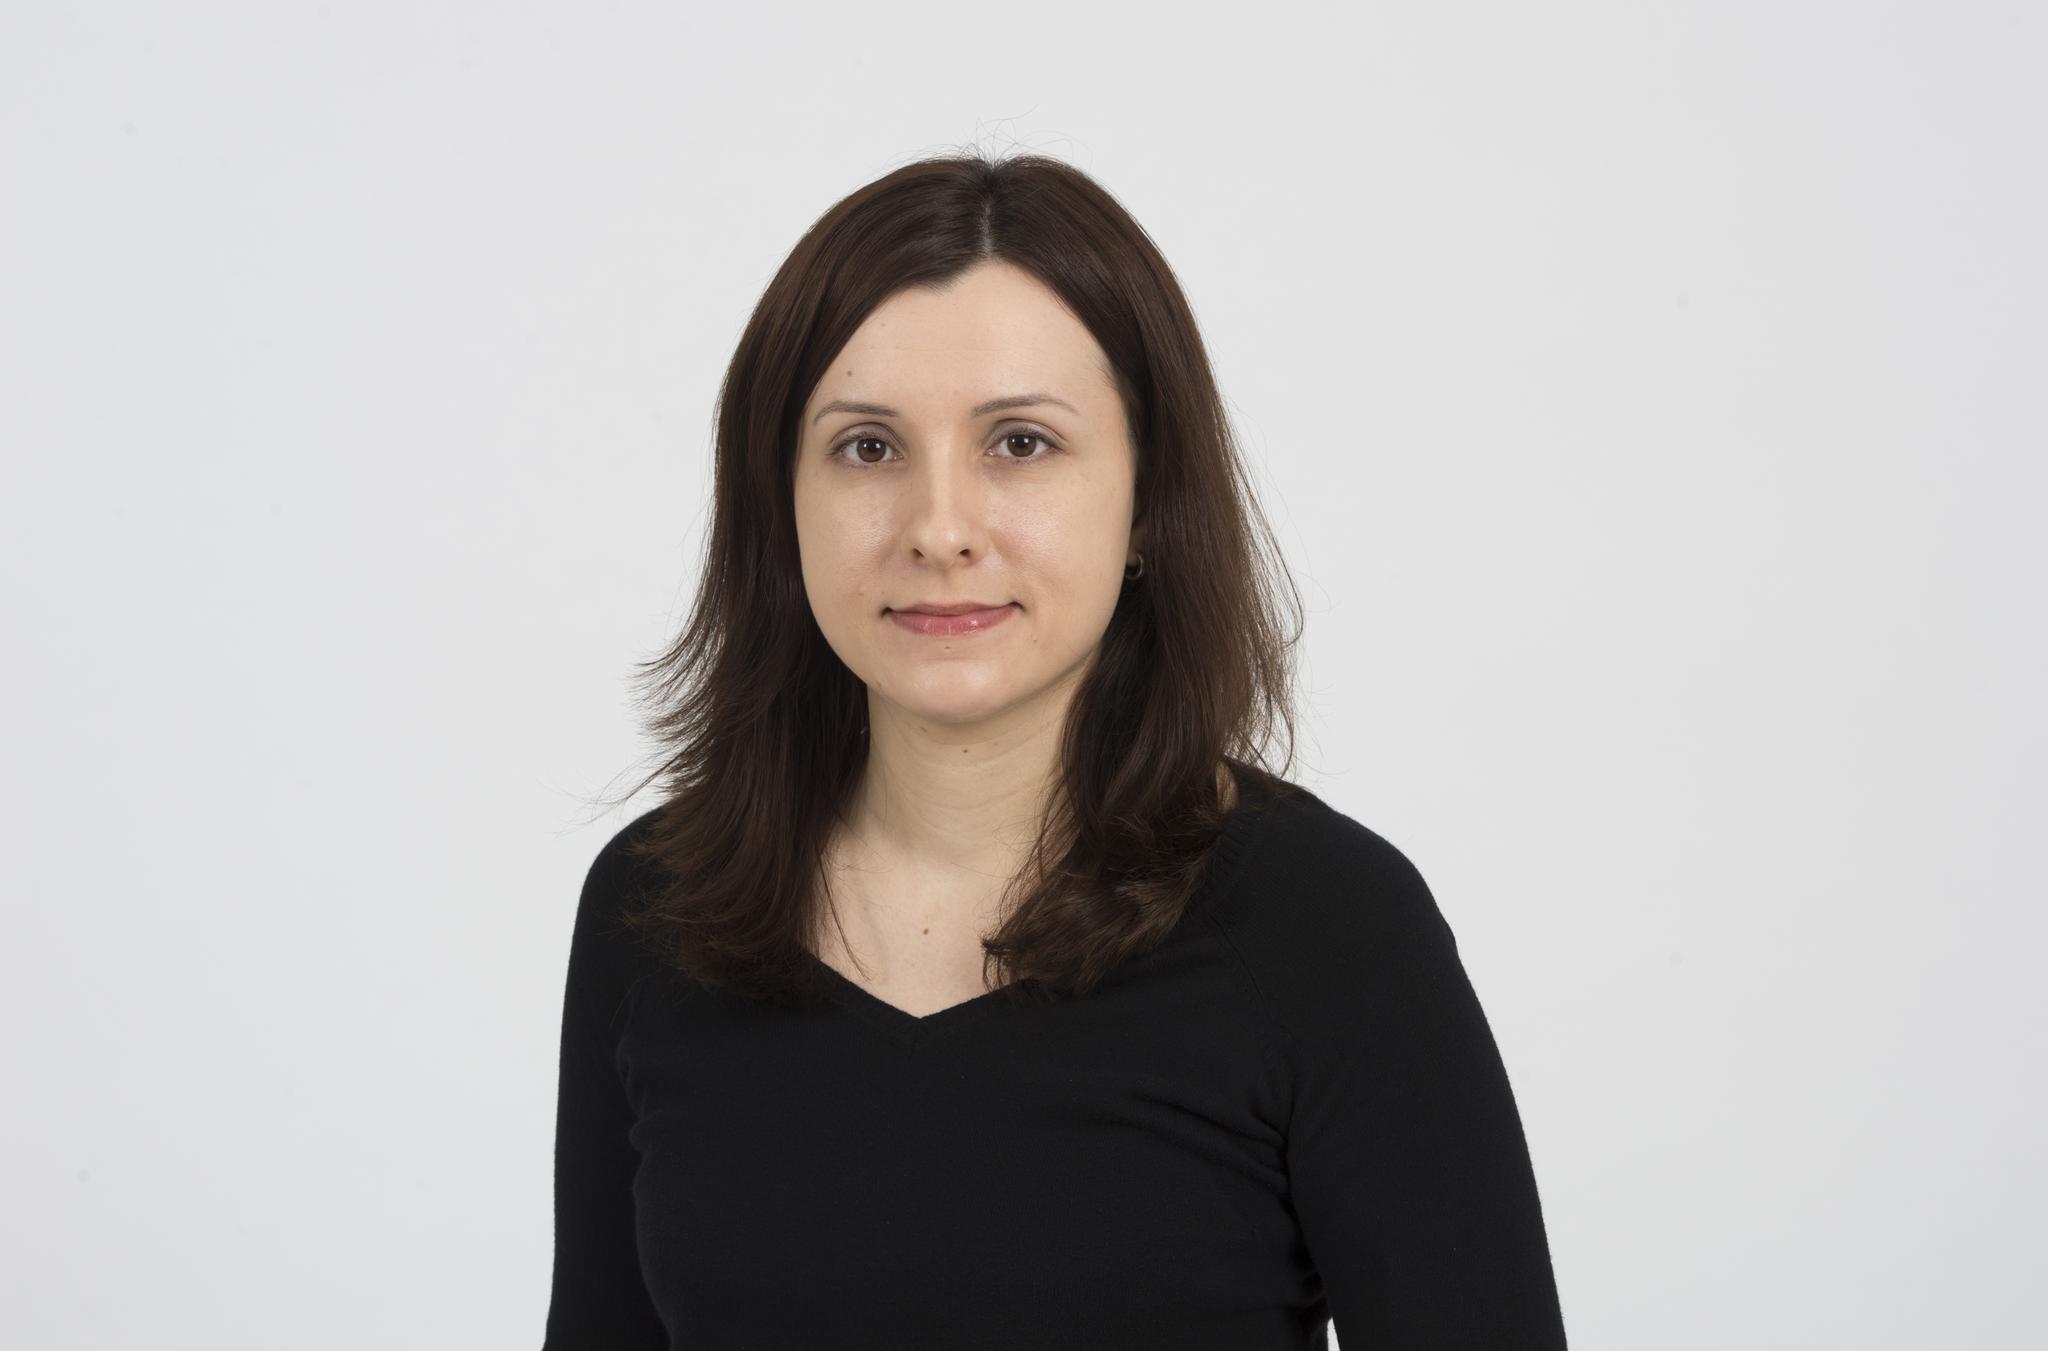 Stanislava Rupp-Bulling